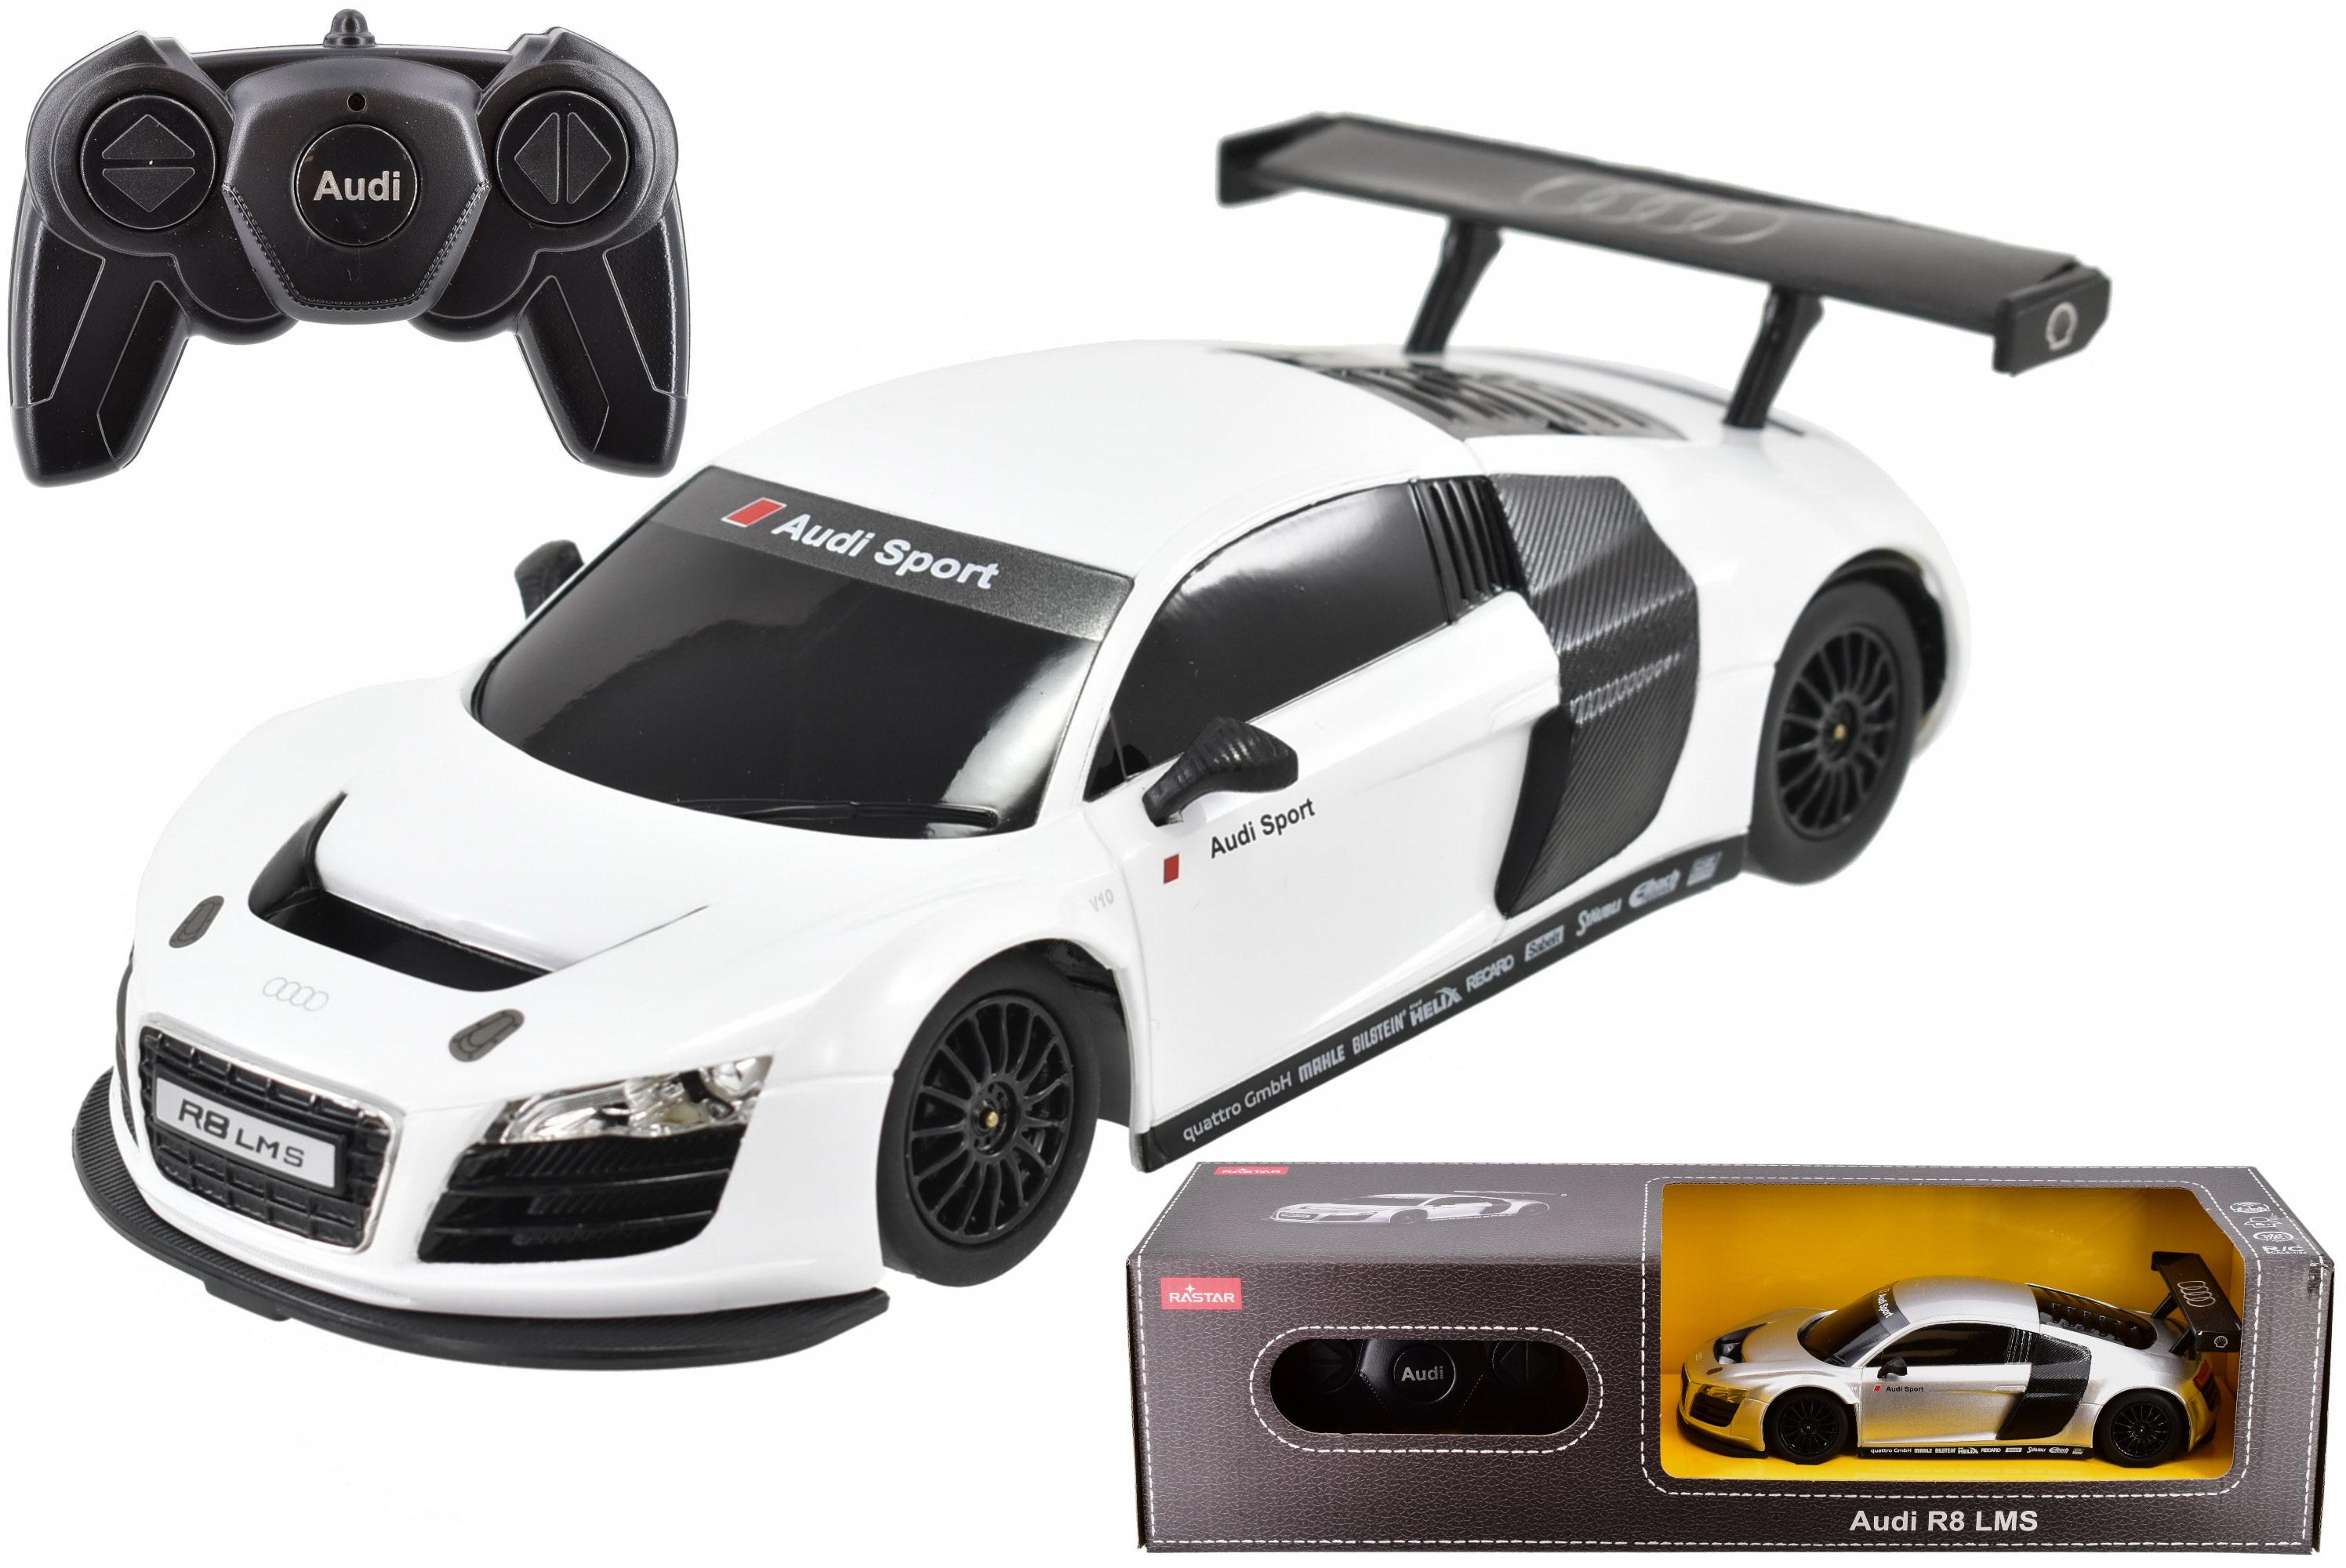 1:24sc Radio Controlled Audi R8 Sport